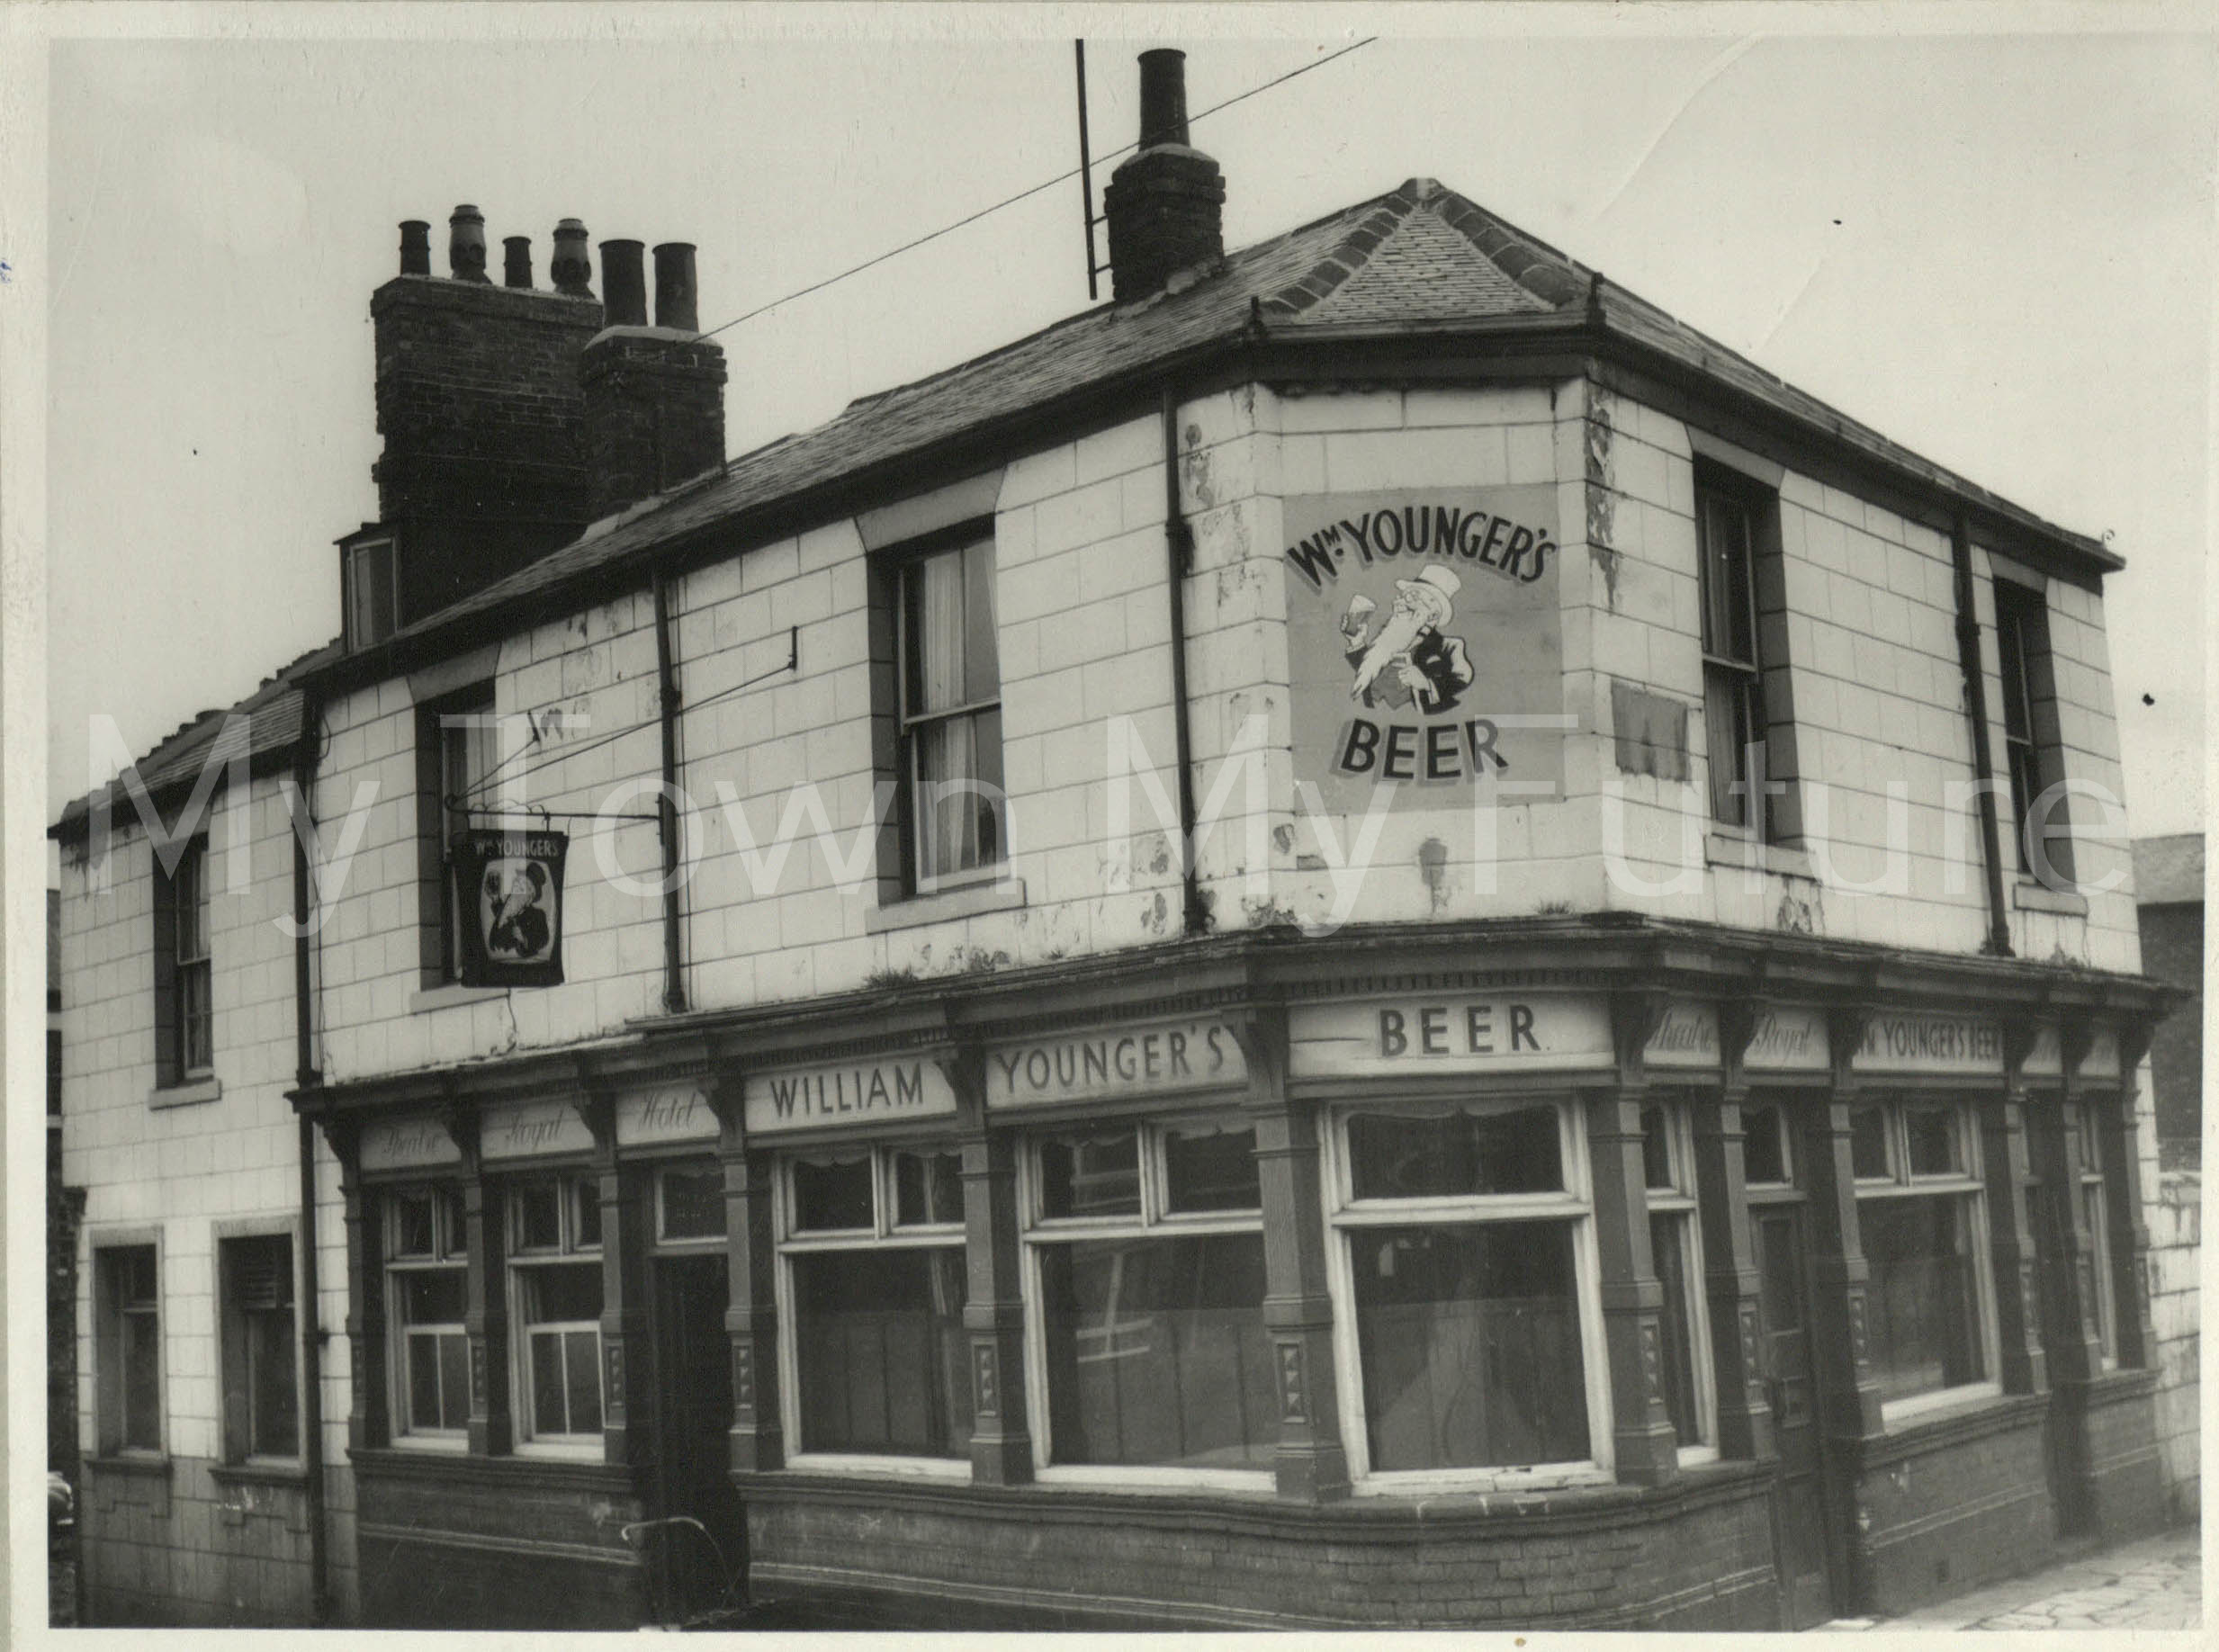 The Theatre Royal, 1866, Gosford Street, St Hilda's - Published 9th October 1963, Evening Gazette